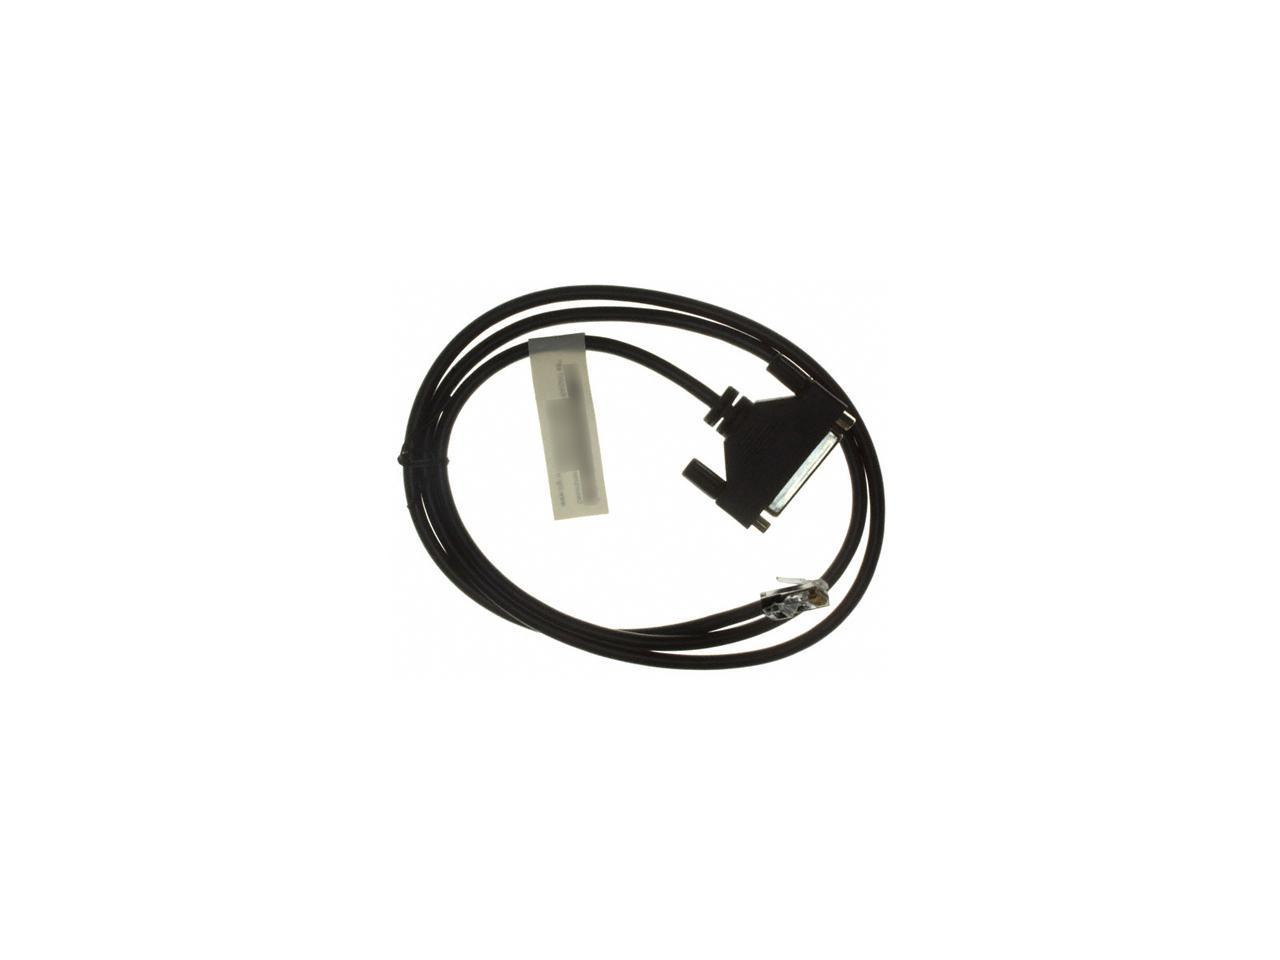 RJ45 to DB9 Cable Digi 76000240